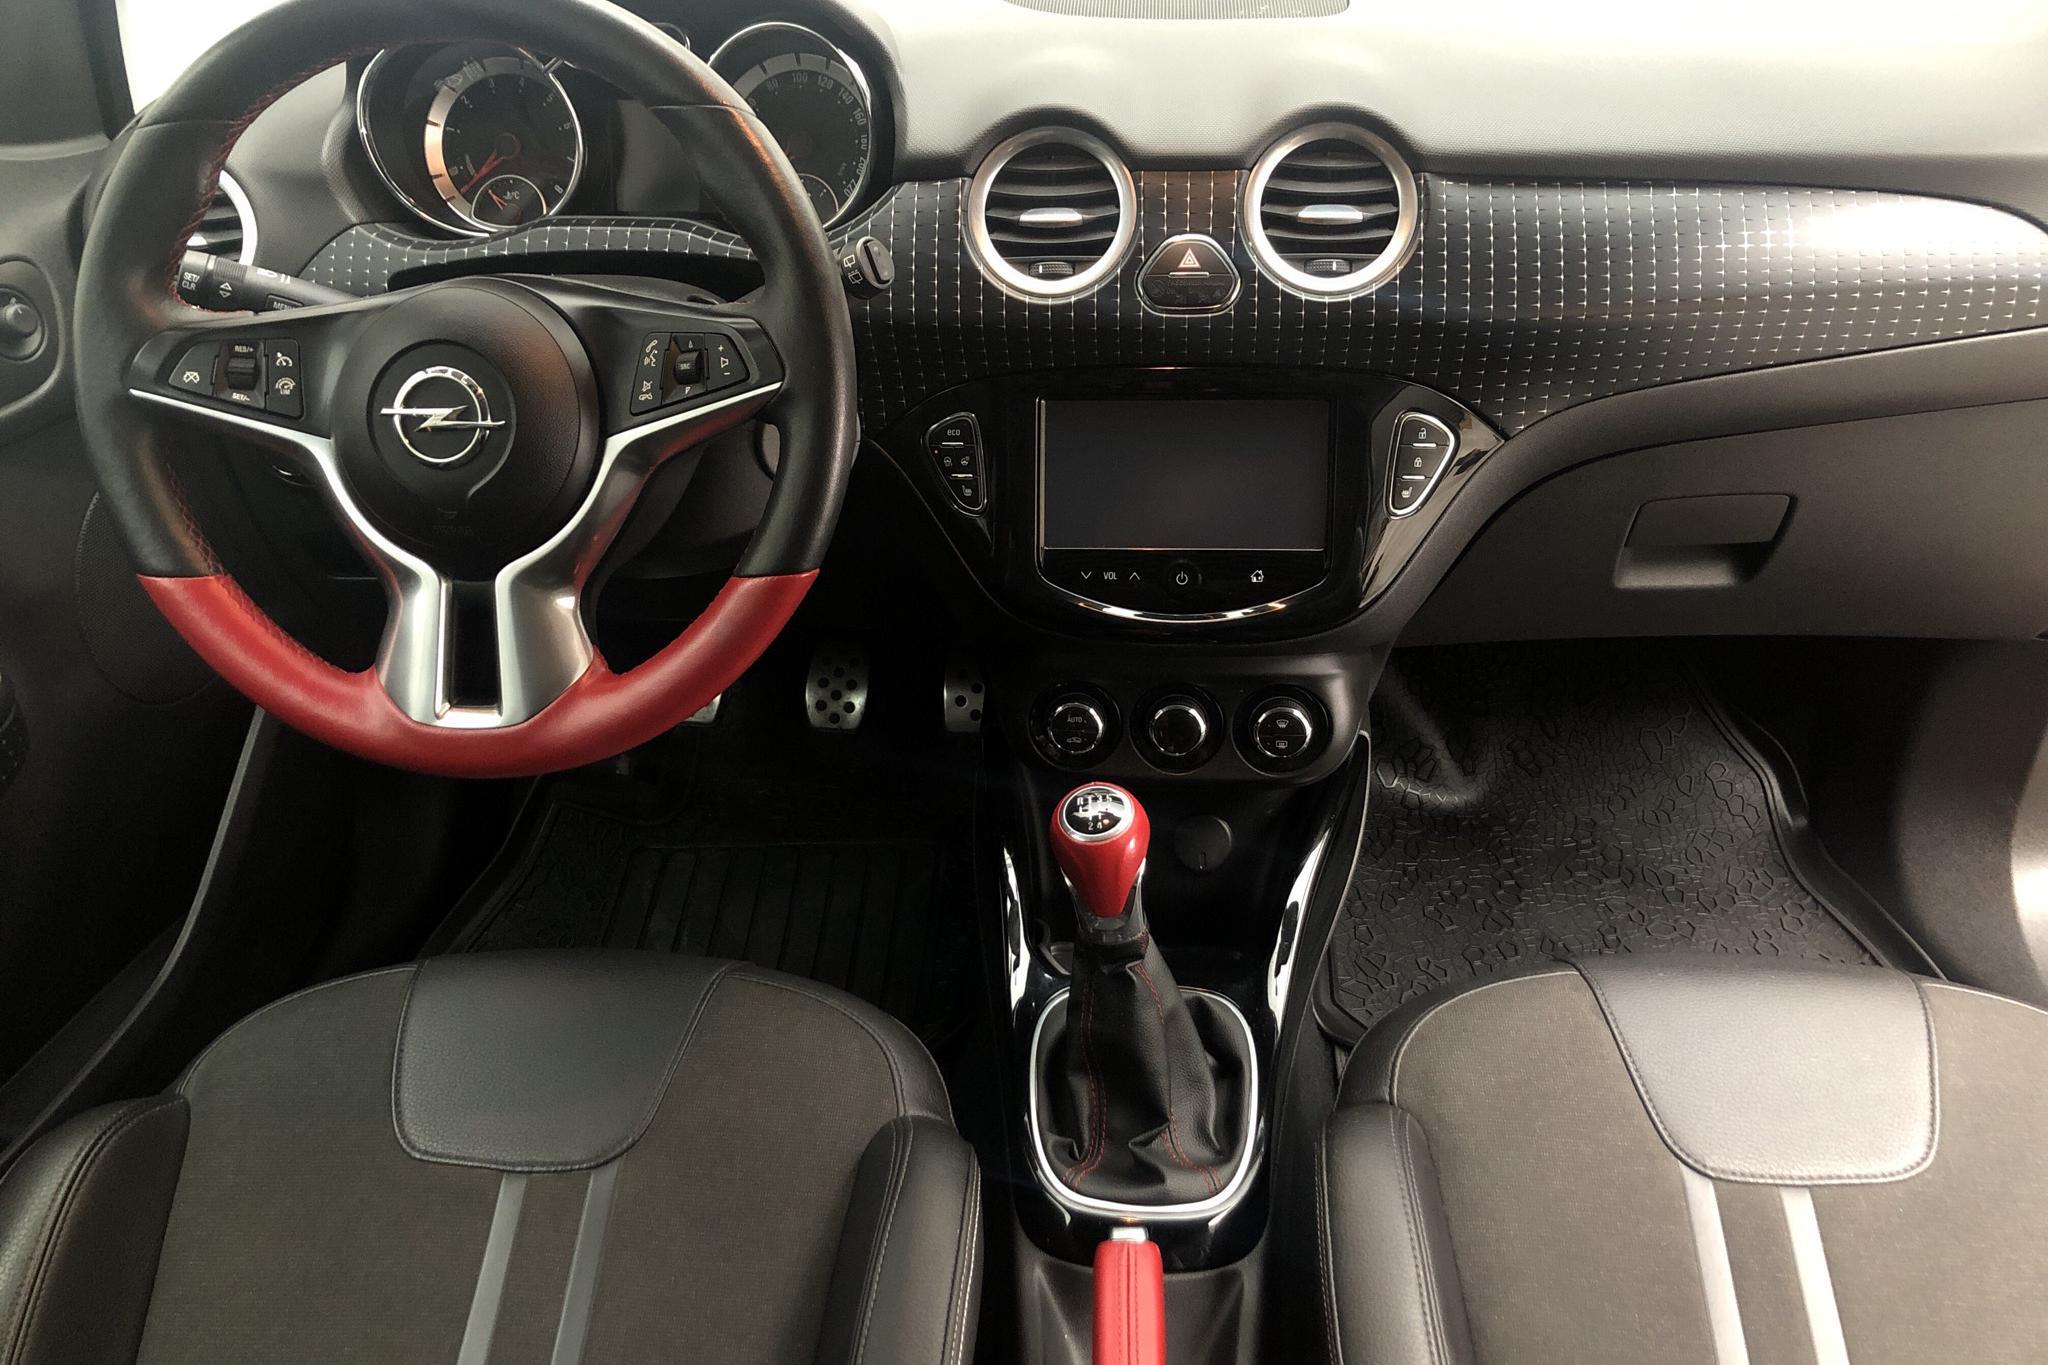 Opel ADAM 1.4 ECOTEC (100hk) - 4 755 mil - Manuell - röd - 2014